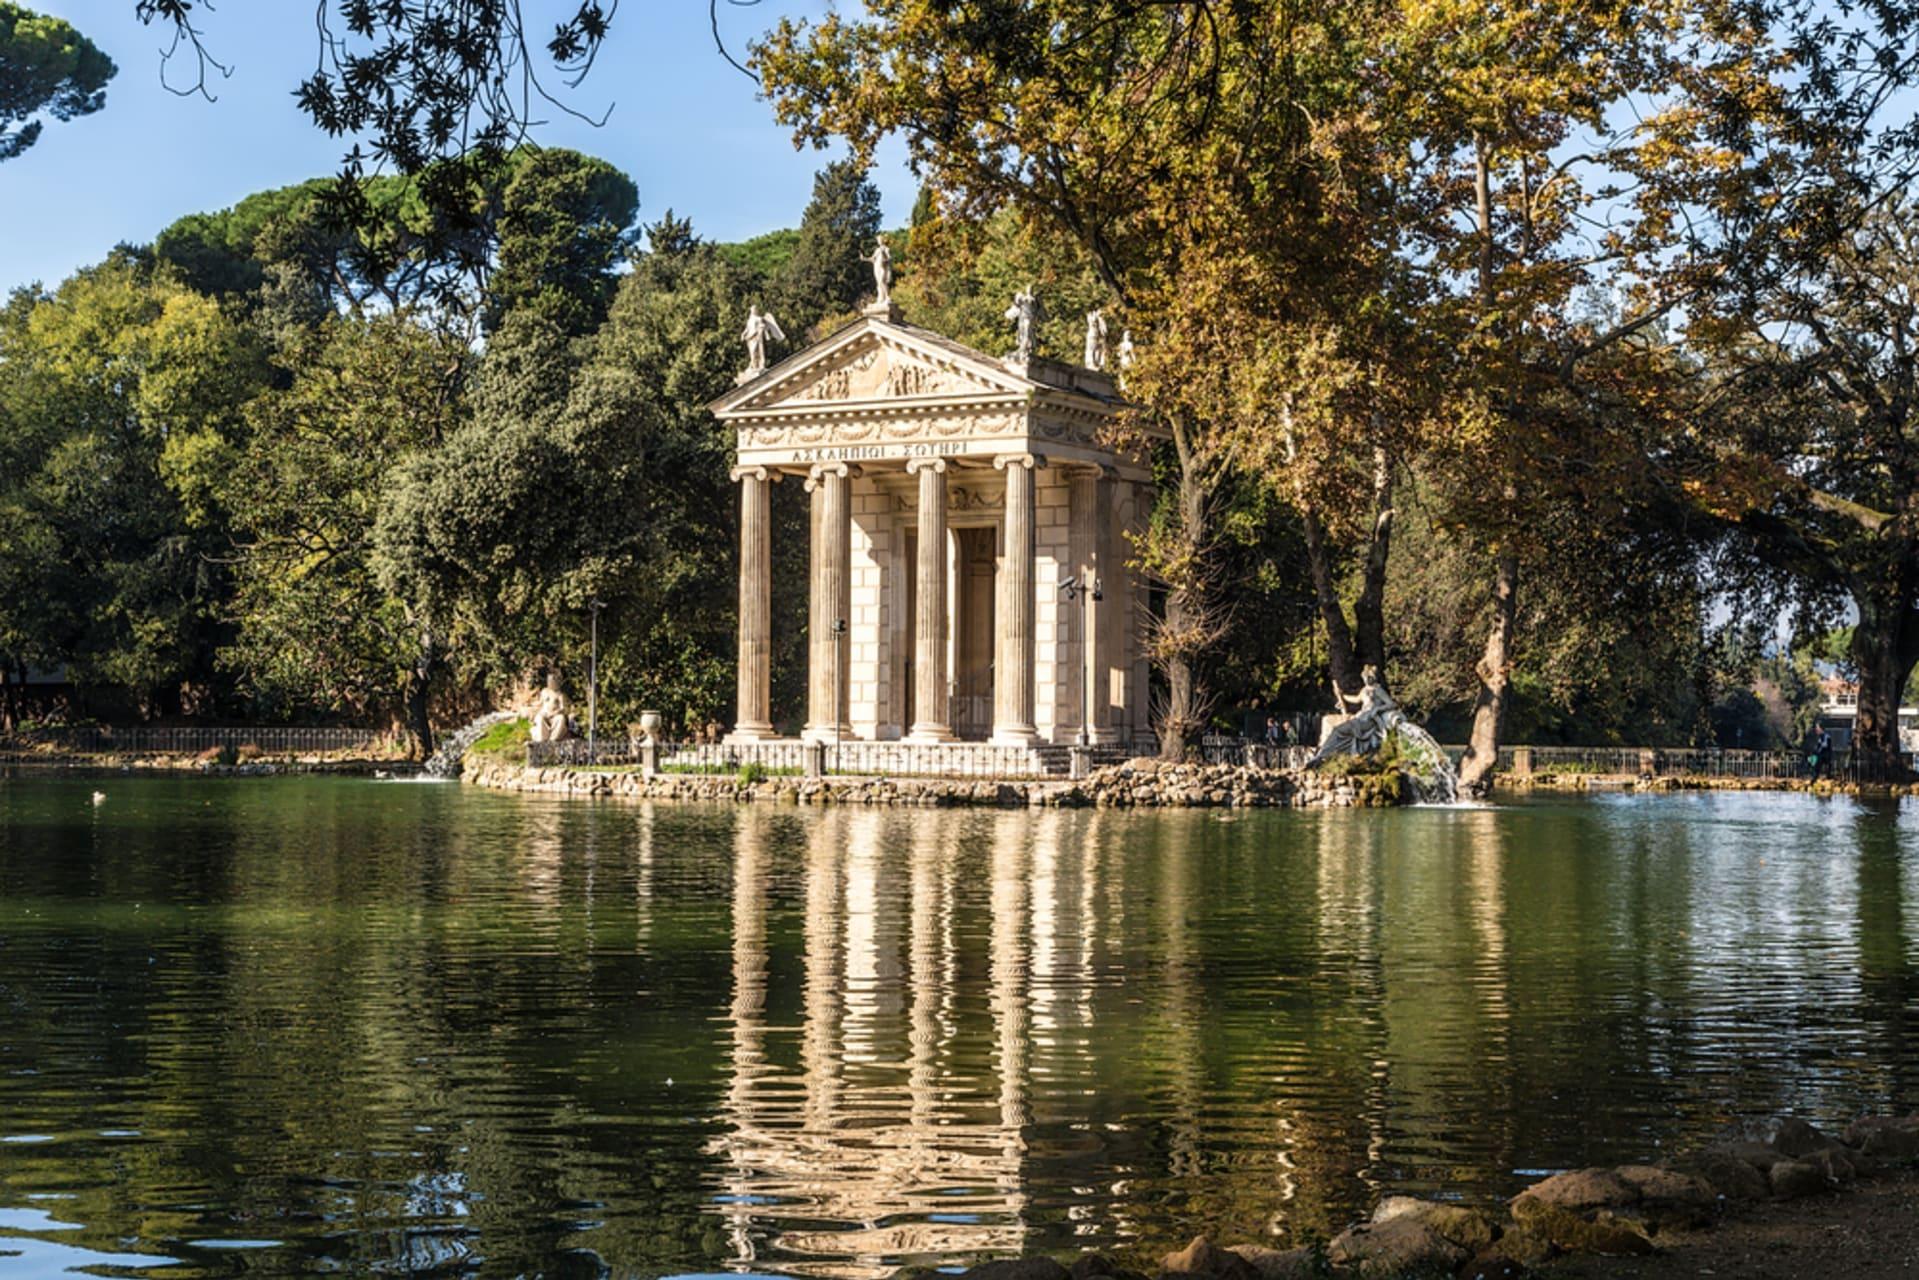 Rome - Special: Romantic Stroll and Boat Ride in Villa Borghese